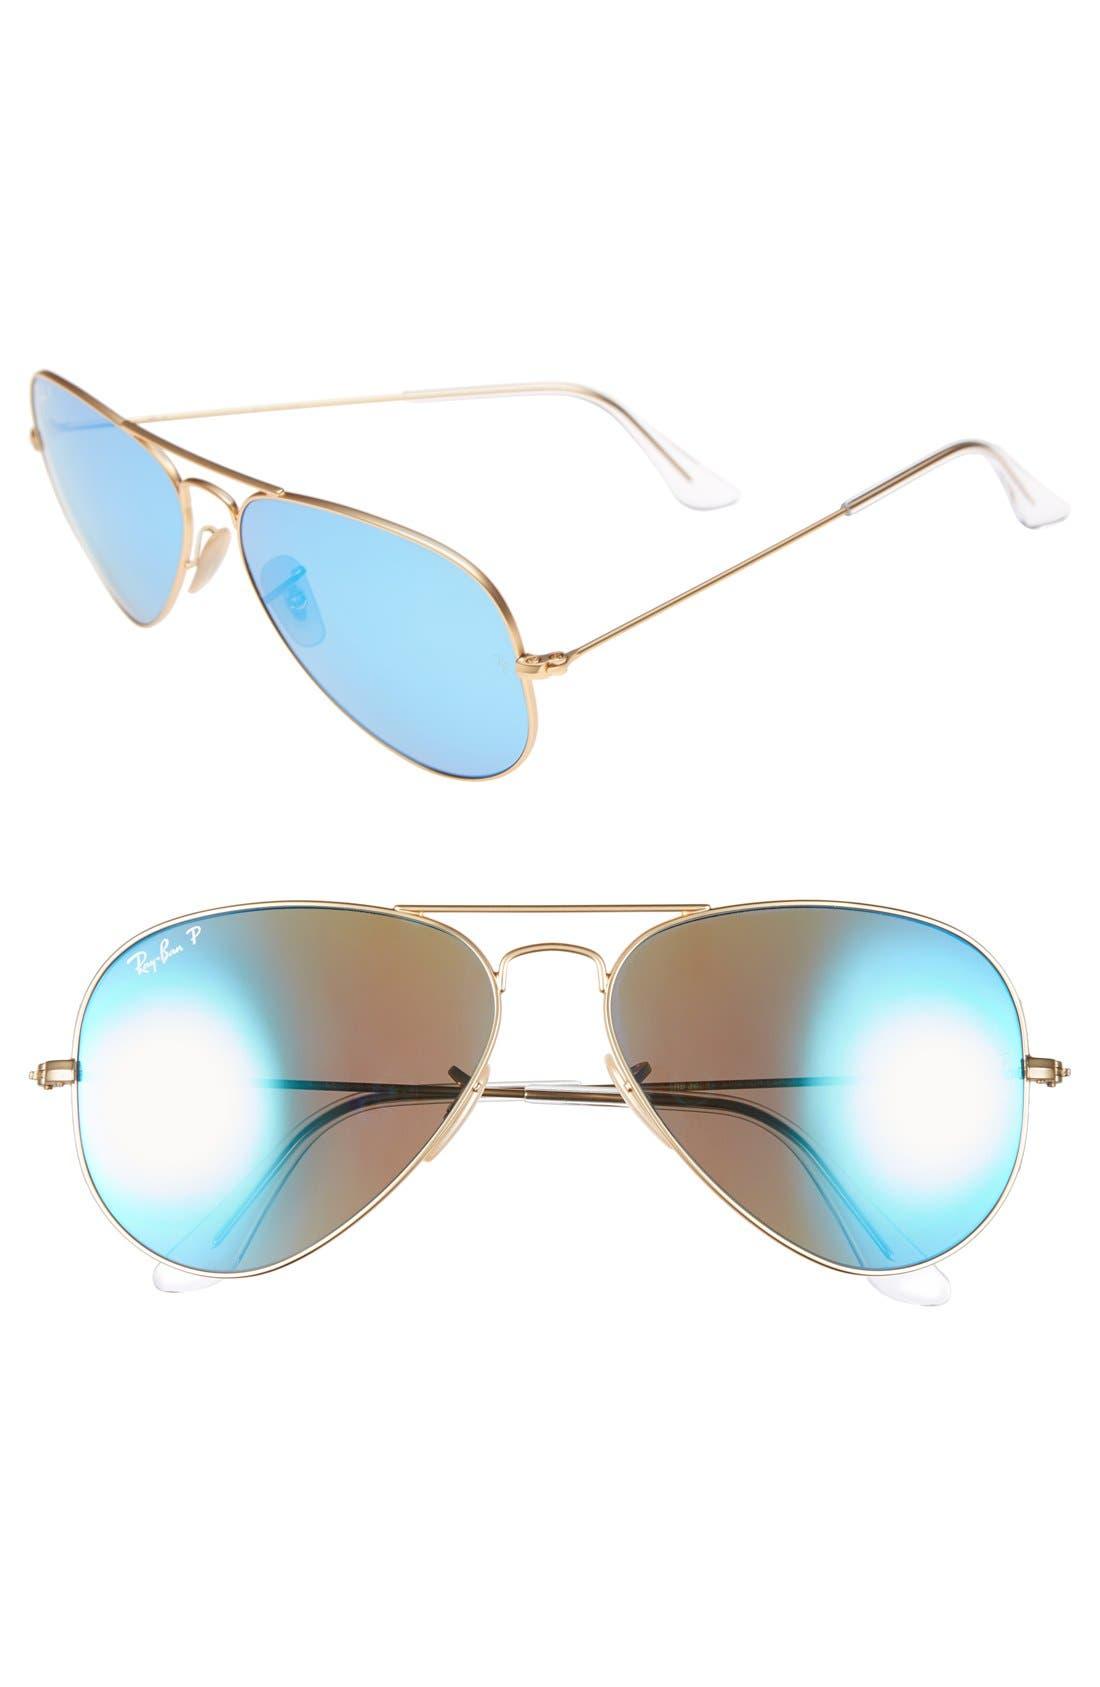 Main Image - Ray-Ban Standard Icons 58mm Mirrored Polarized Aviator Sunglasses